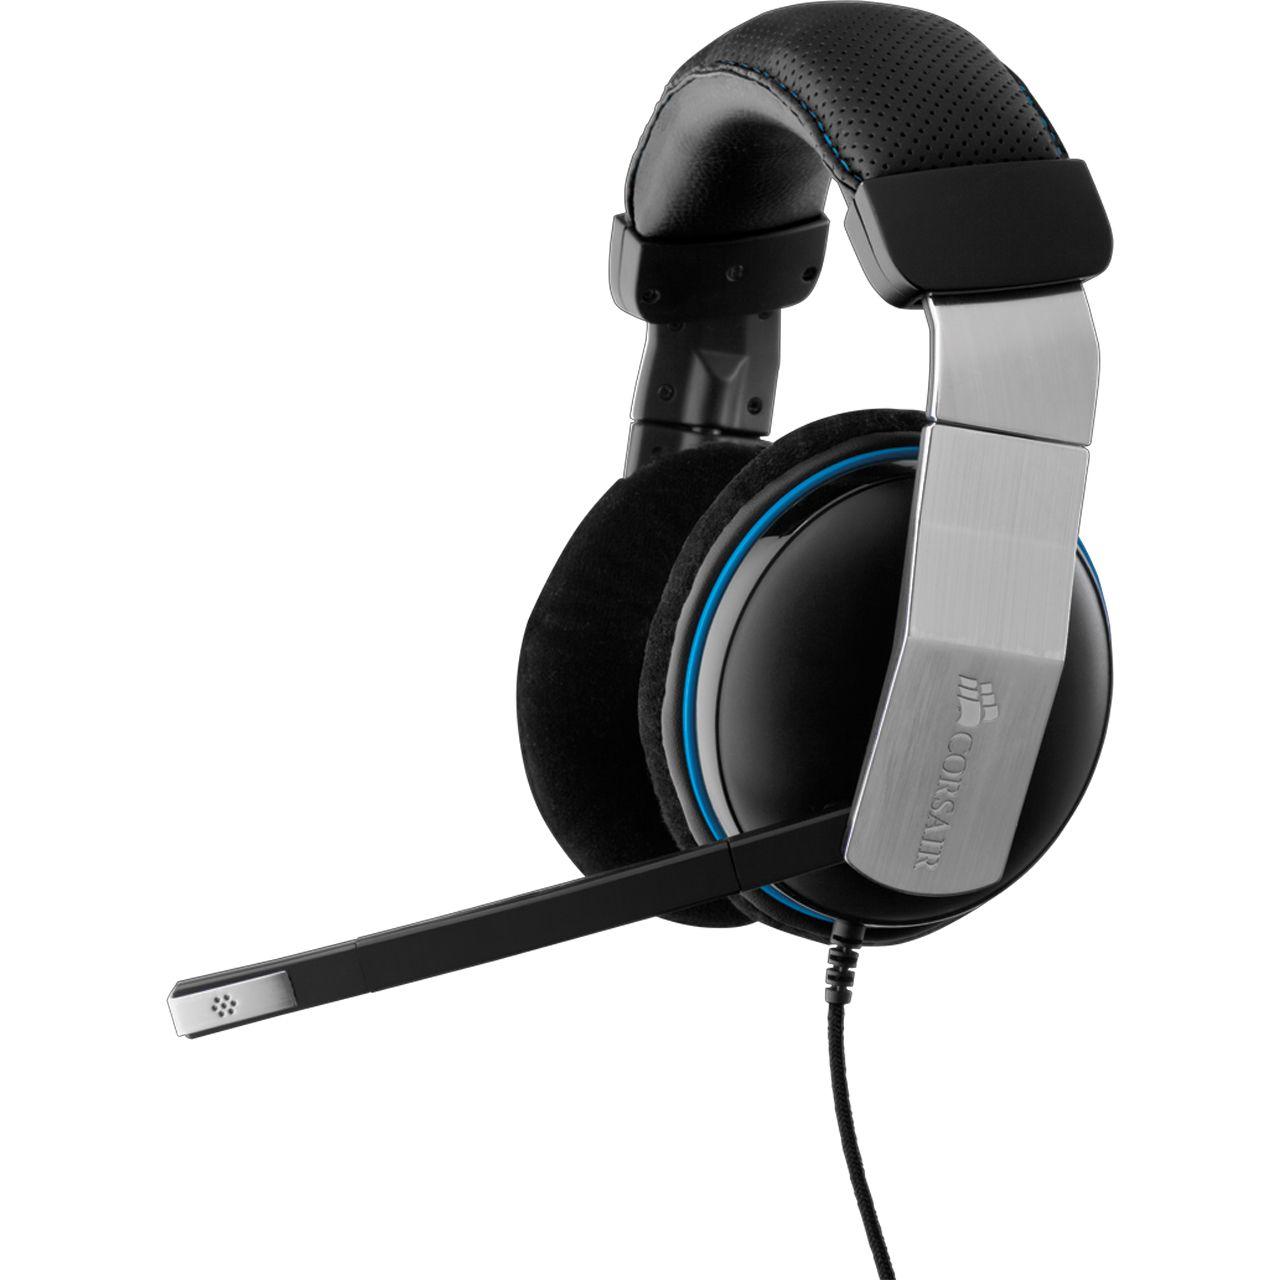 Corsair Vengeance 1500 Dolby 7.1 Driver Download